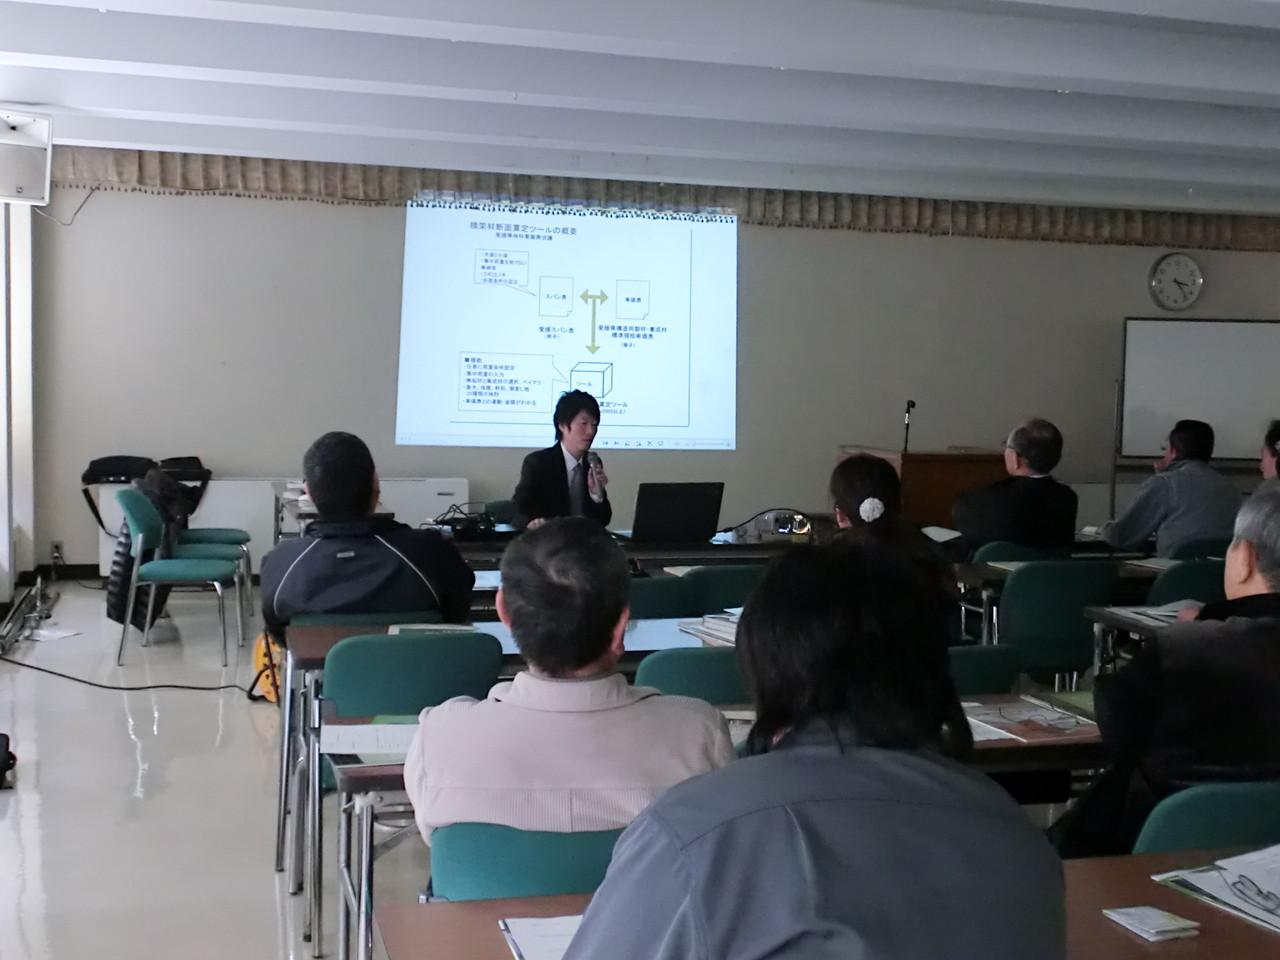 愛媛県建築士会技術講演会「森林の未来は木造建築にあり」